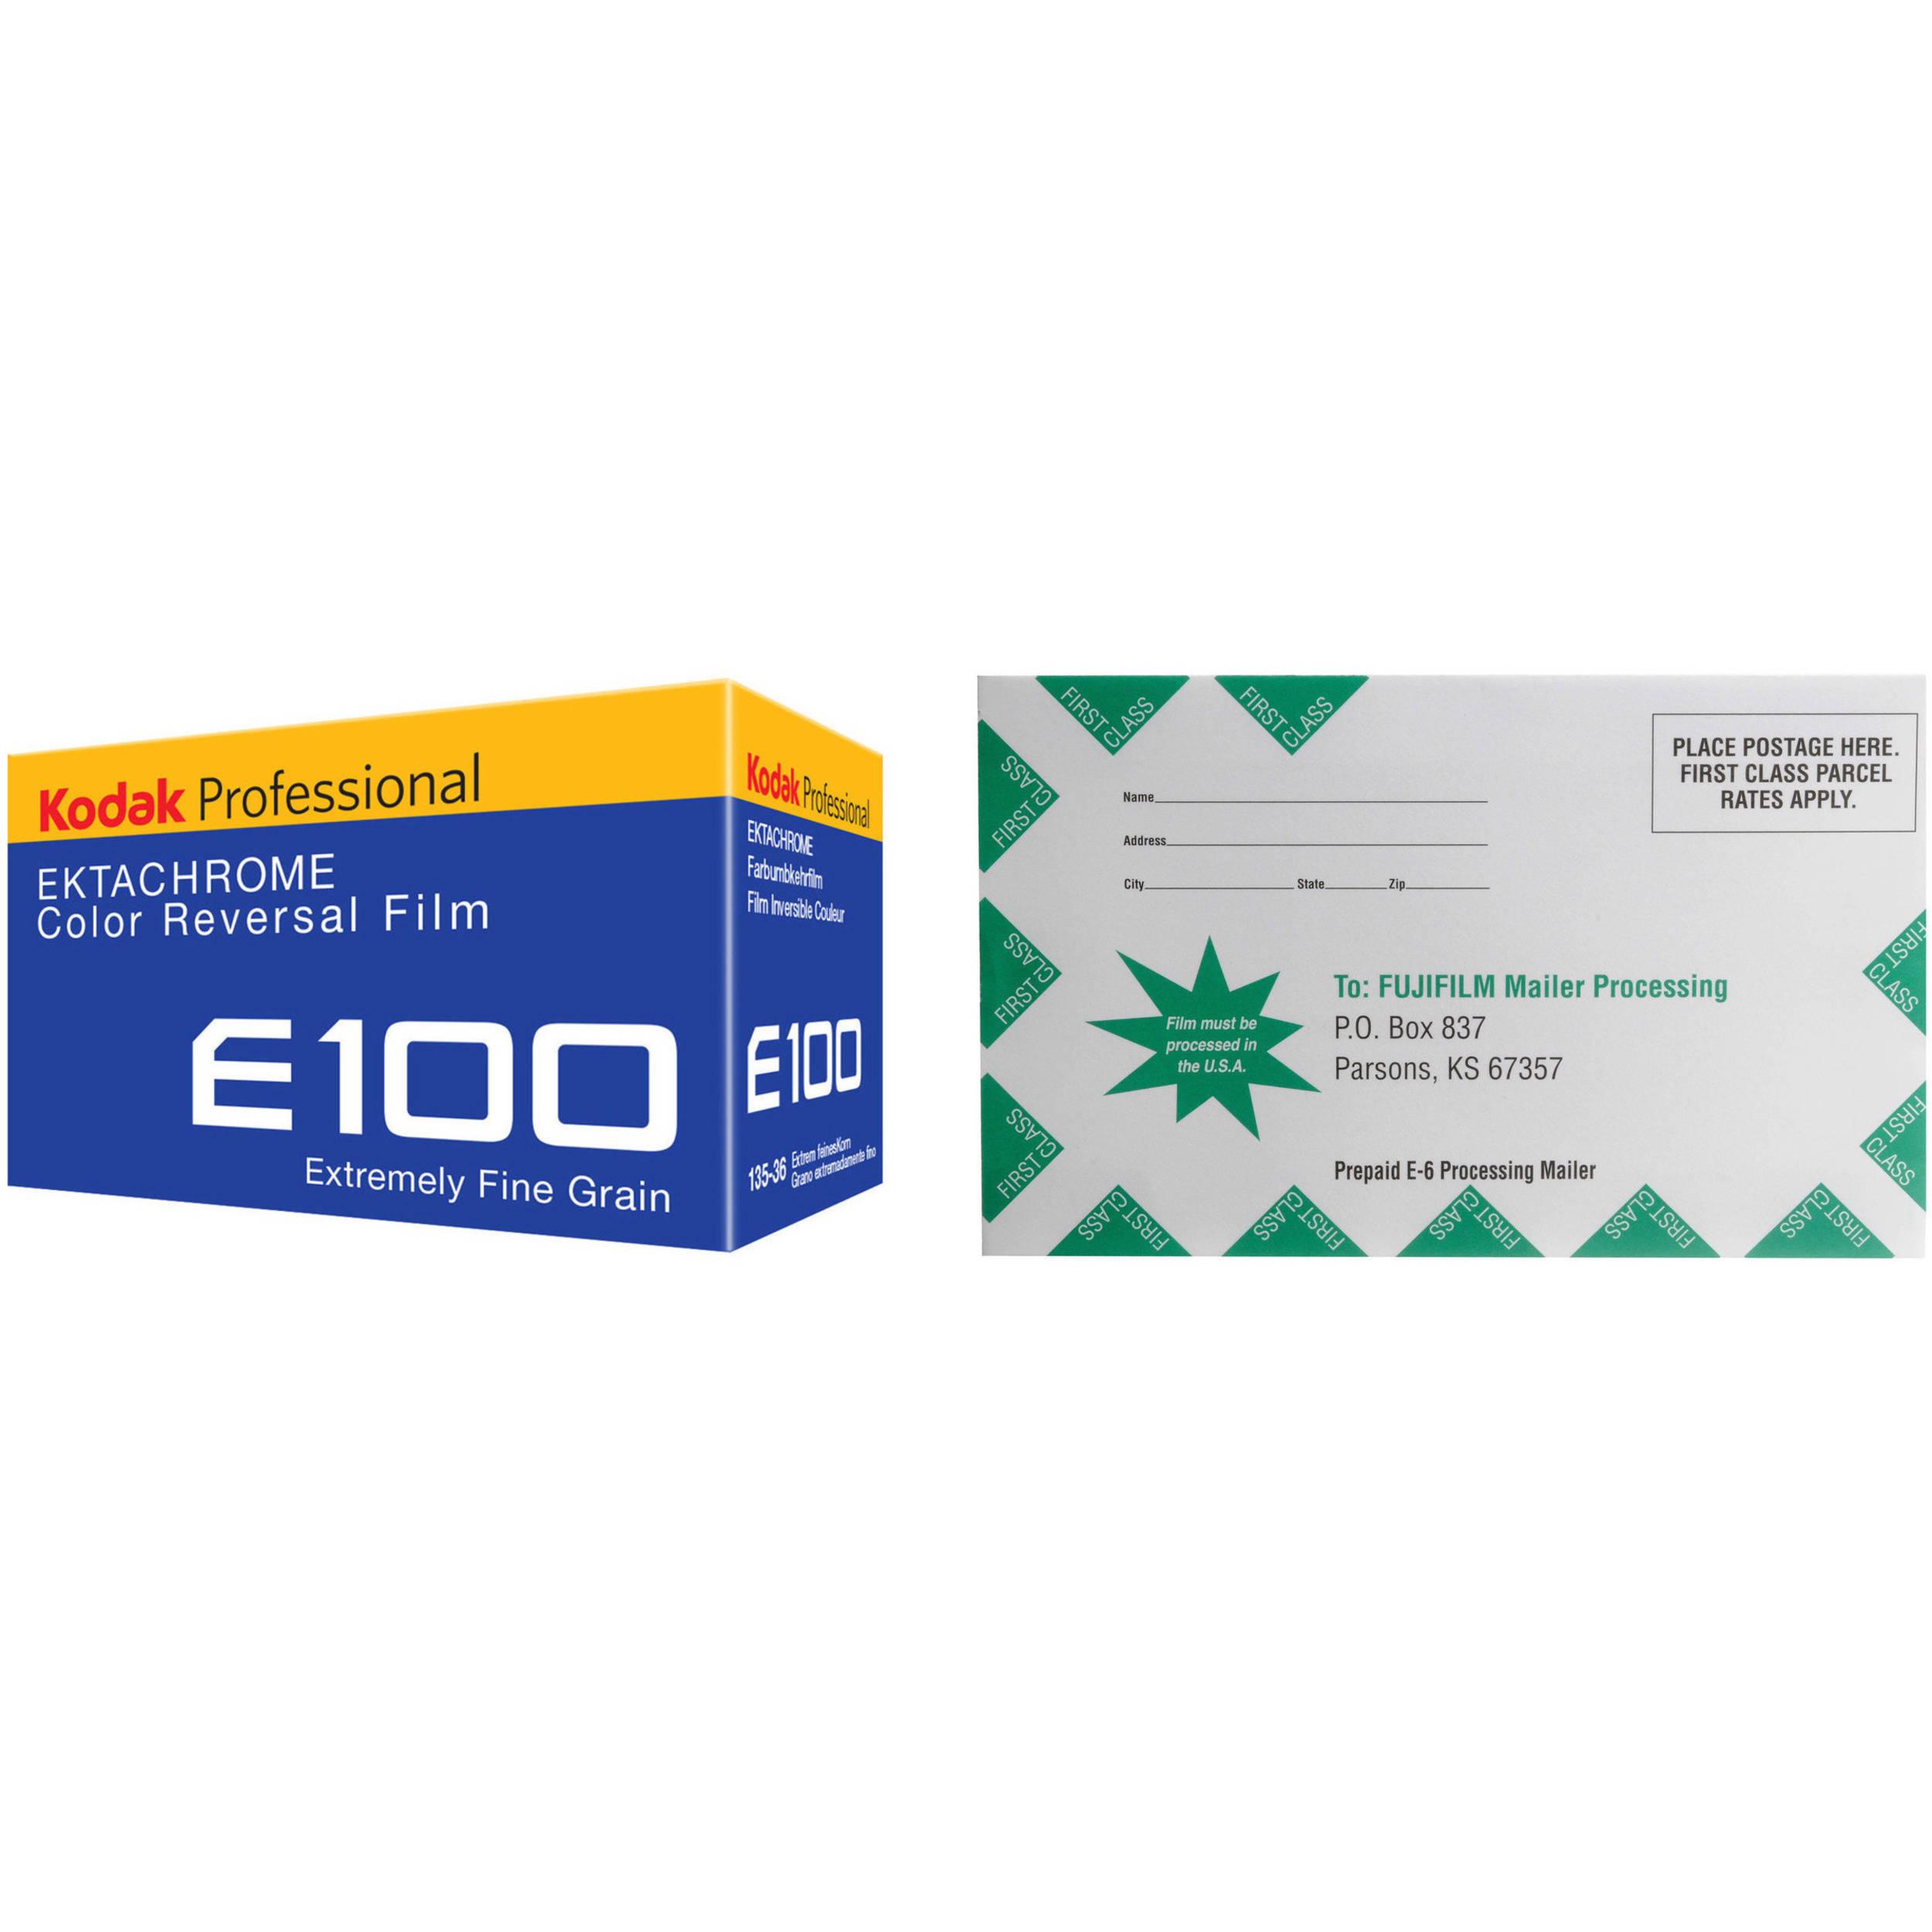 Kodak Professional Ektachrome E100 Color Transparency Film With Processing Mailer Kit 35mm Roll Film 36 Exposures